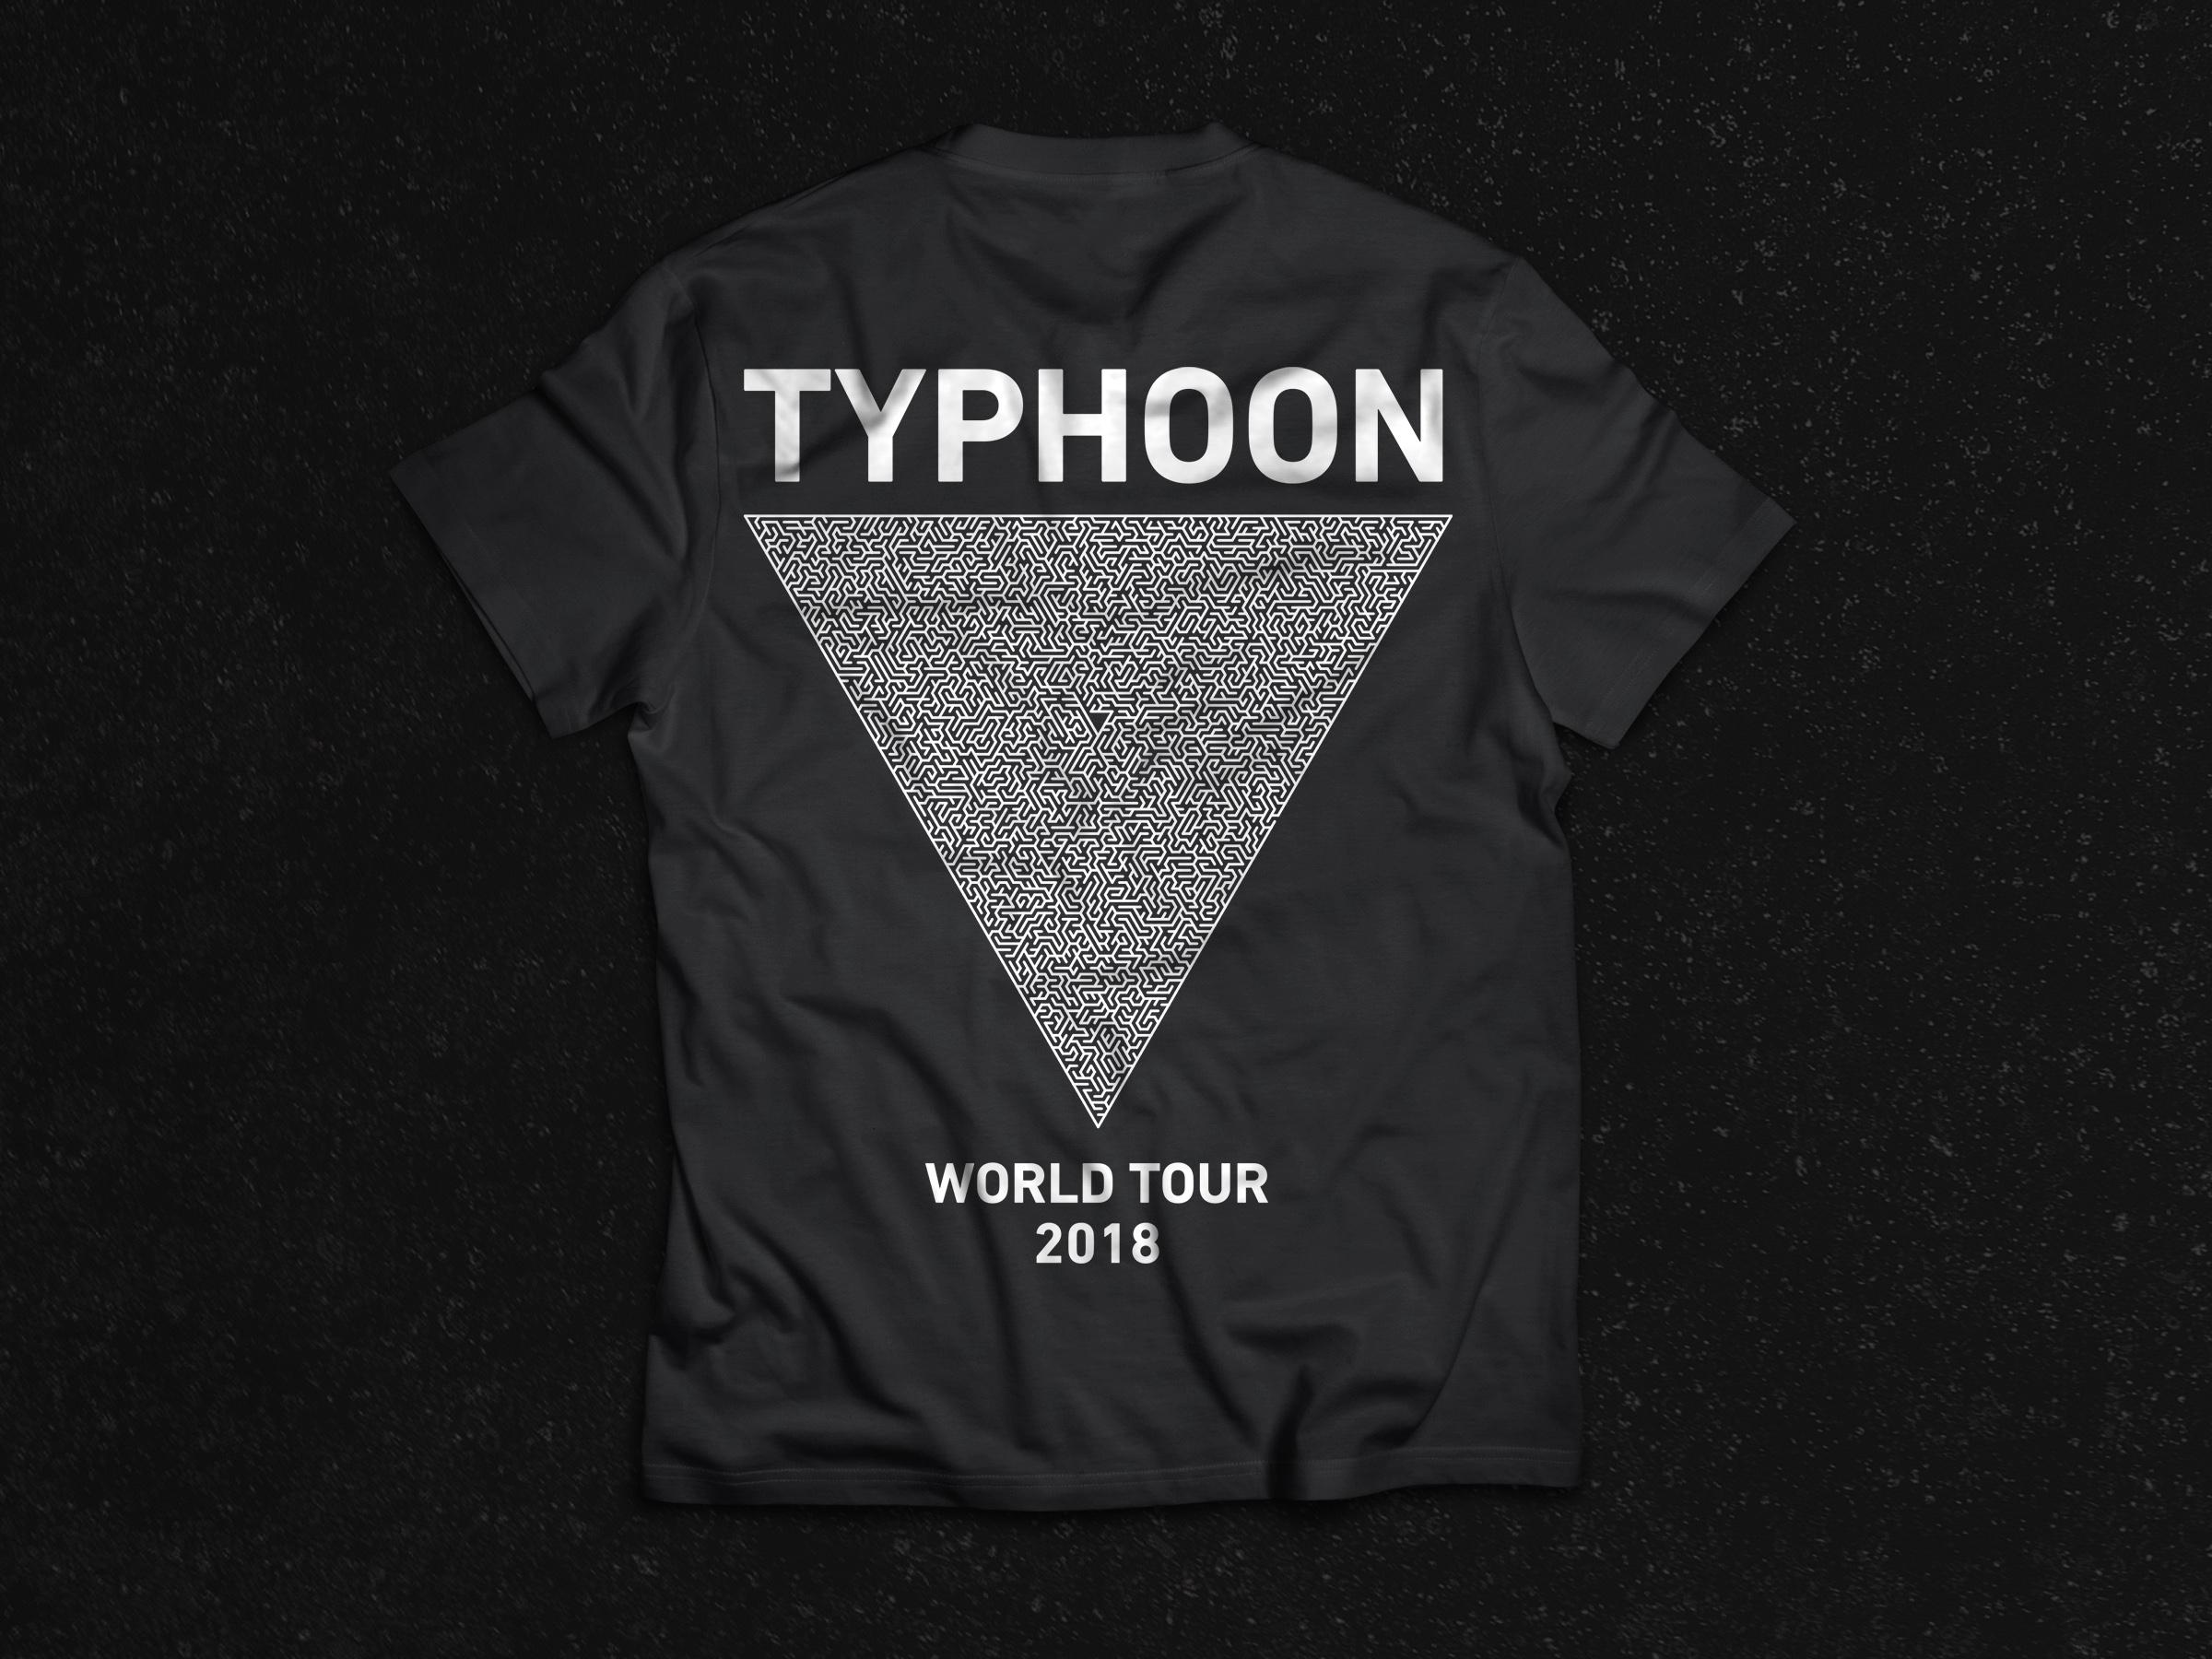 Typhoon2018_BlackTeeBack.jpg